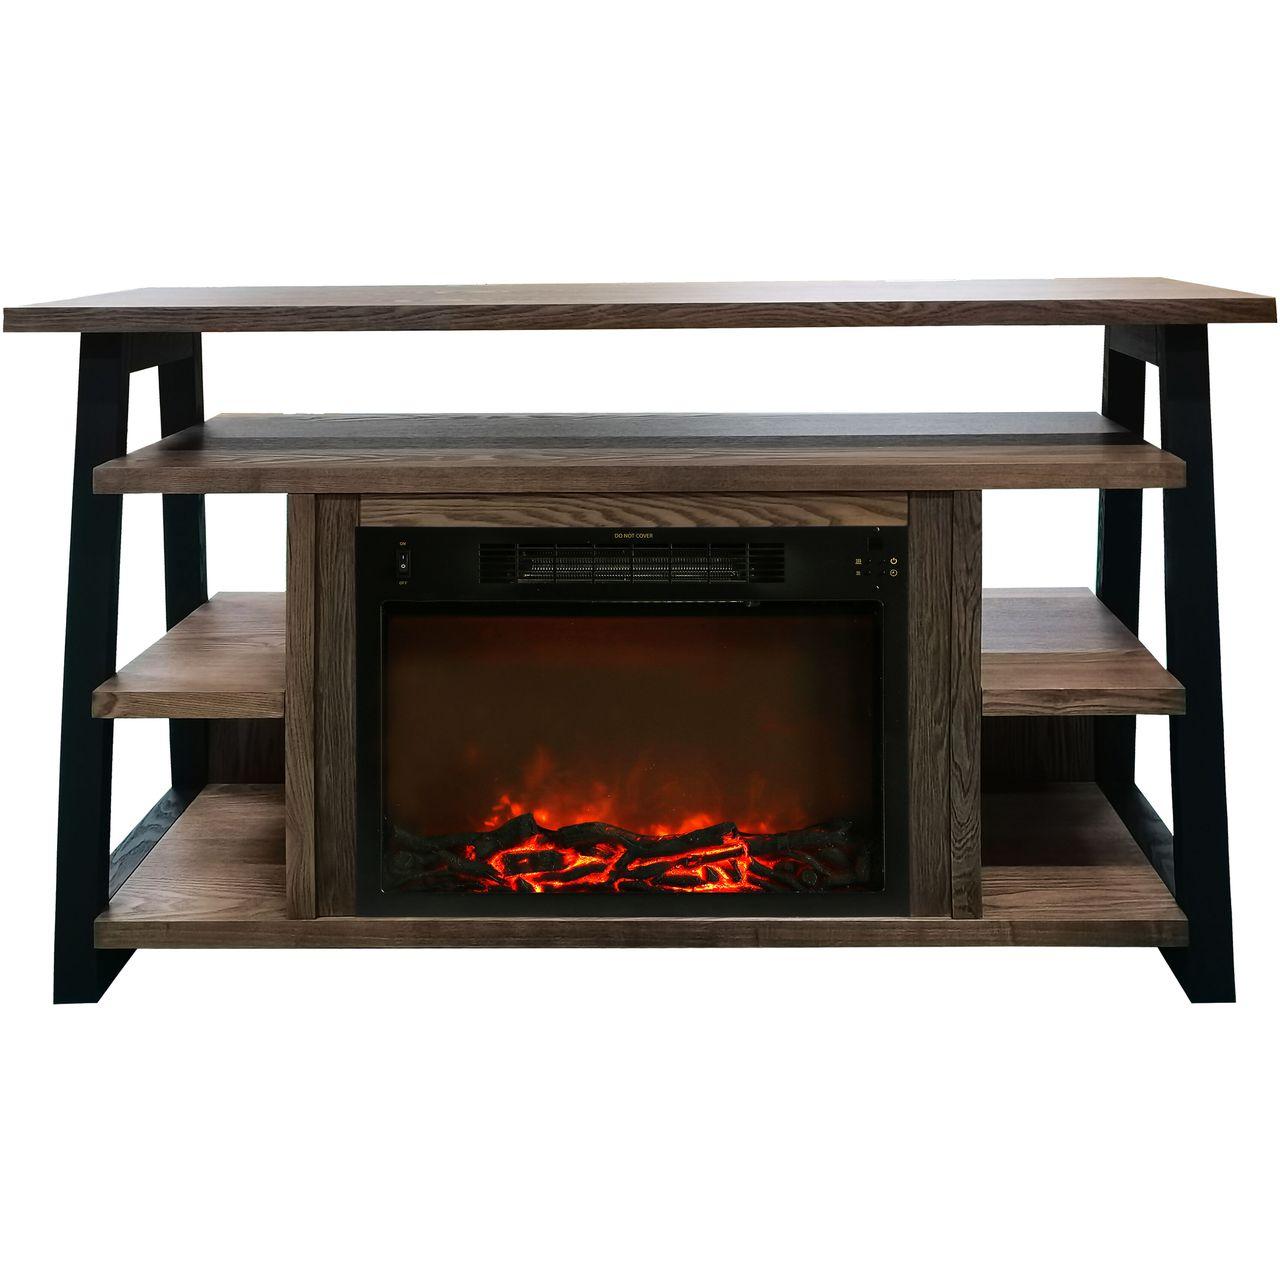 "Cambridge 32"" Sawyer Electric Fireplace Mantel/Logs - Walnut"